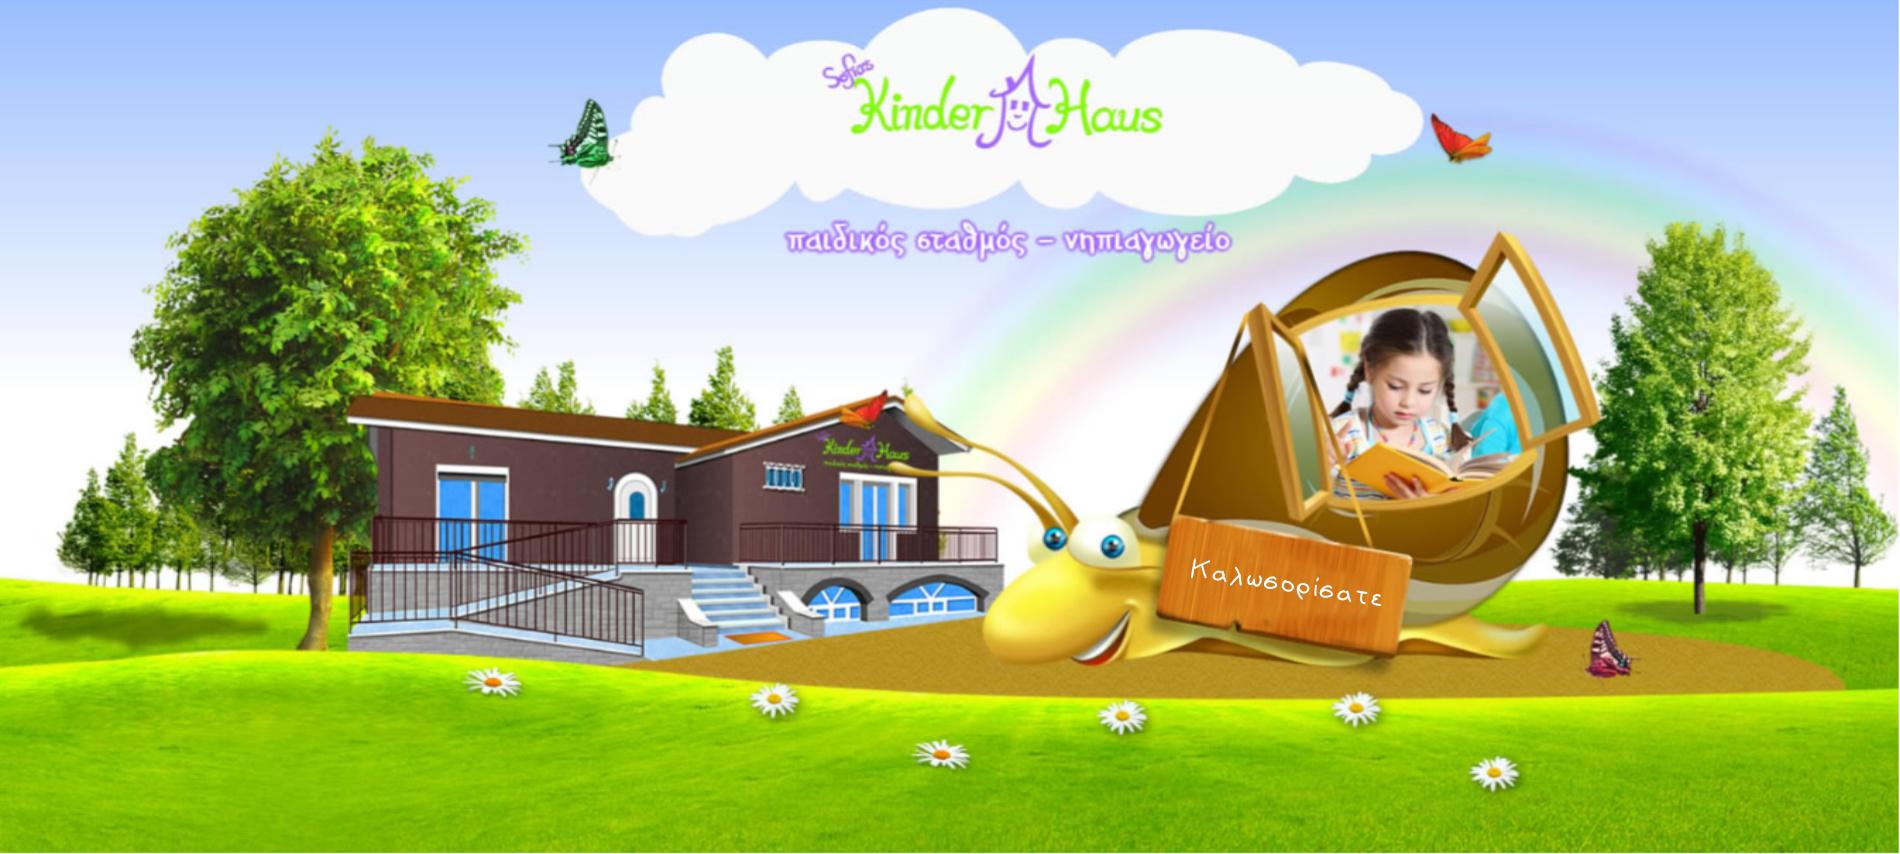 Kinderhaus - Καλωσόρισμα